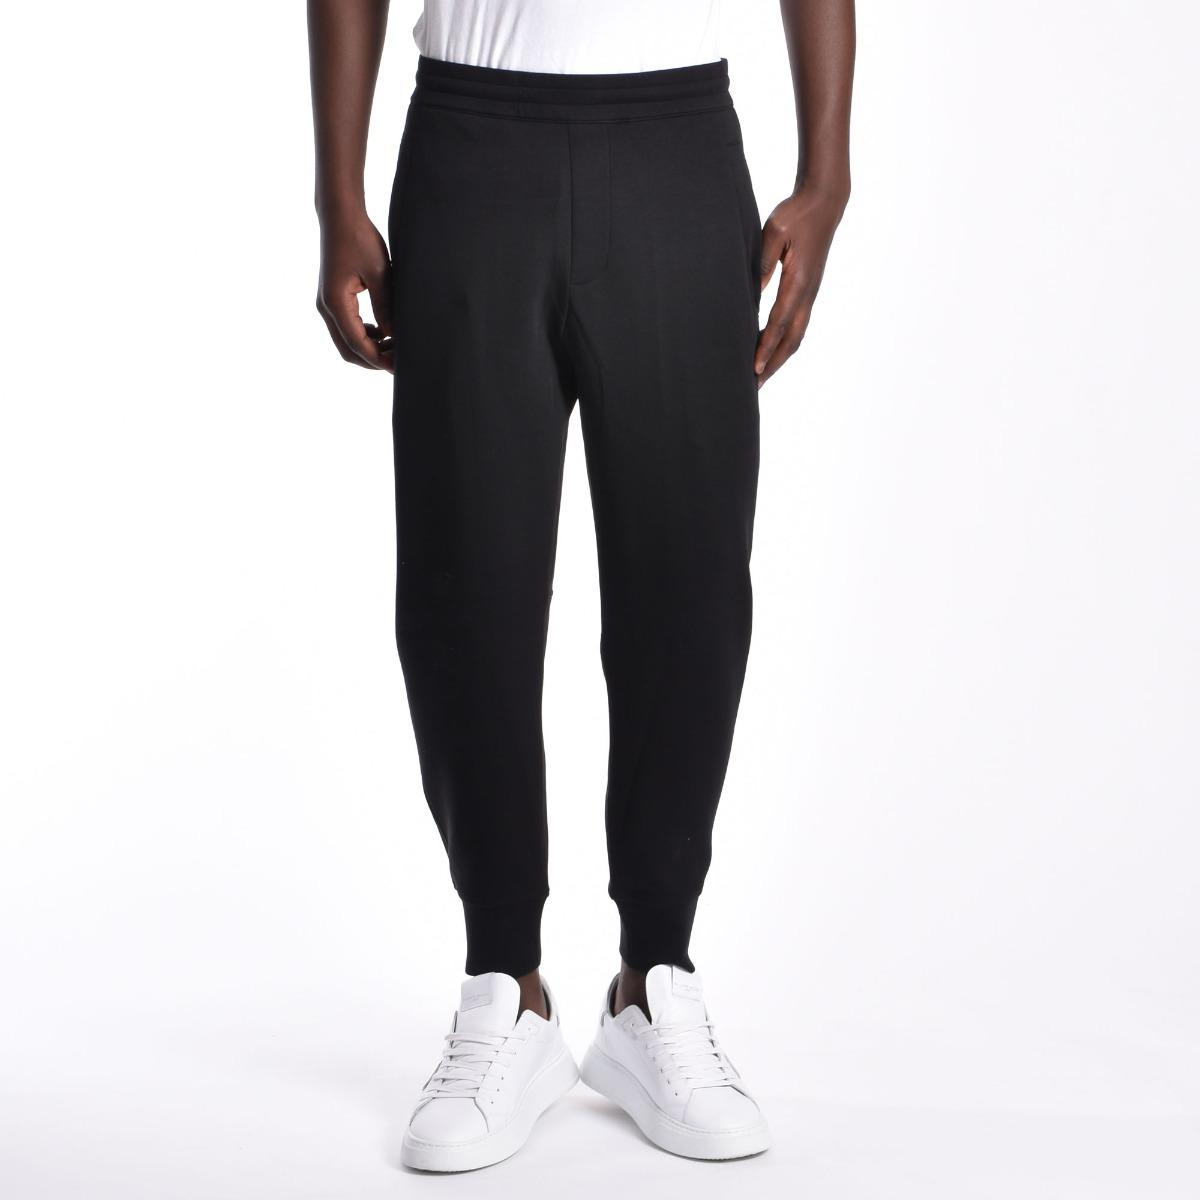 Pantalone tuta logo laterale - Nero